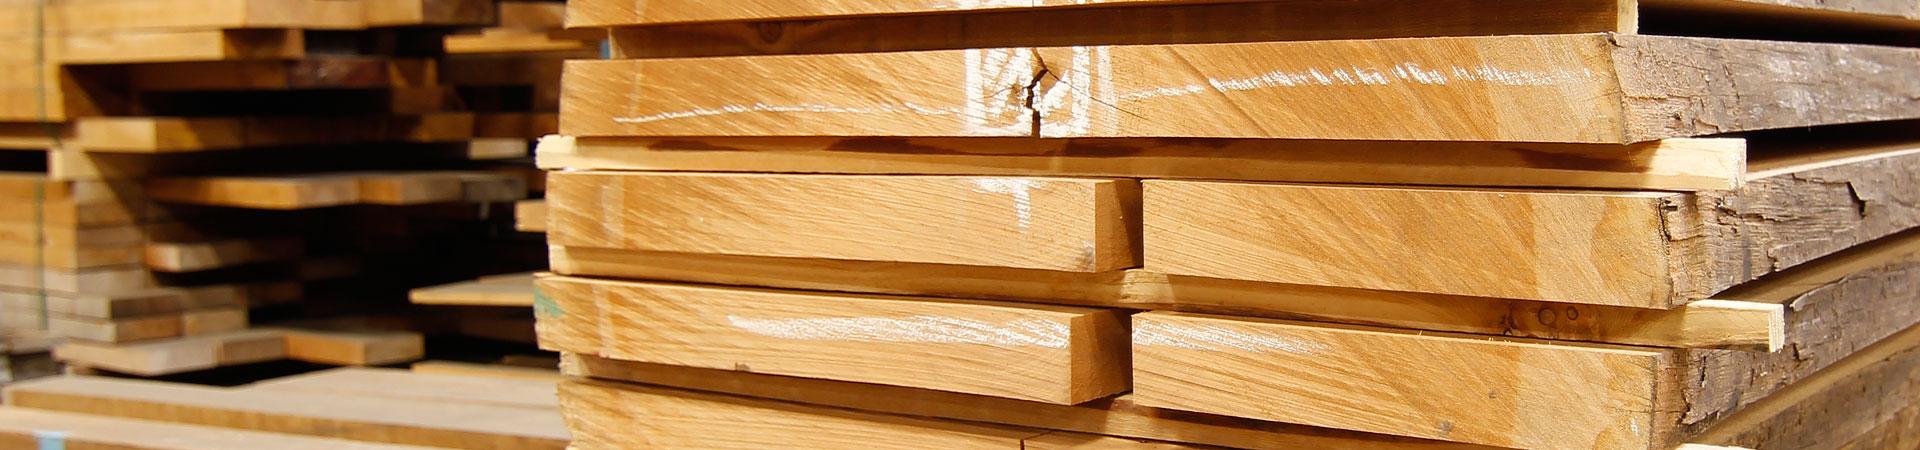 Om oss - Kärnsund Wood Link